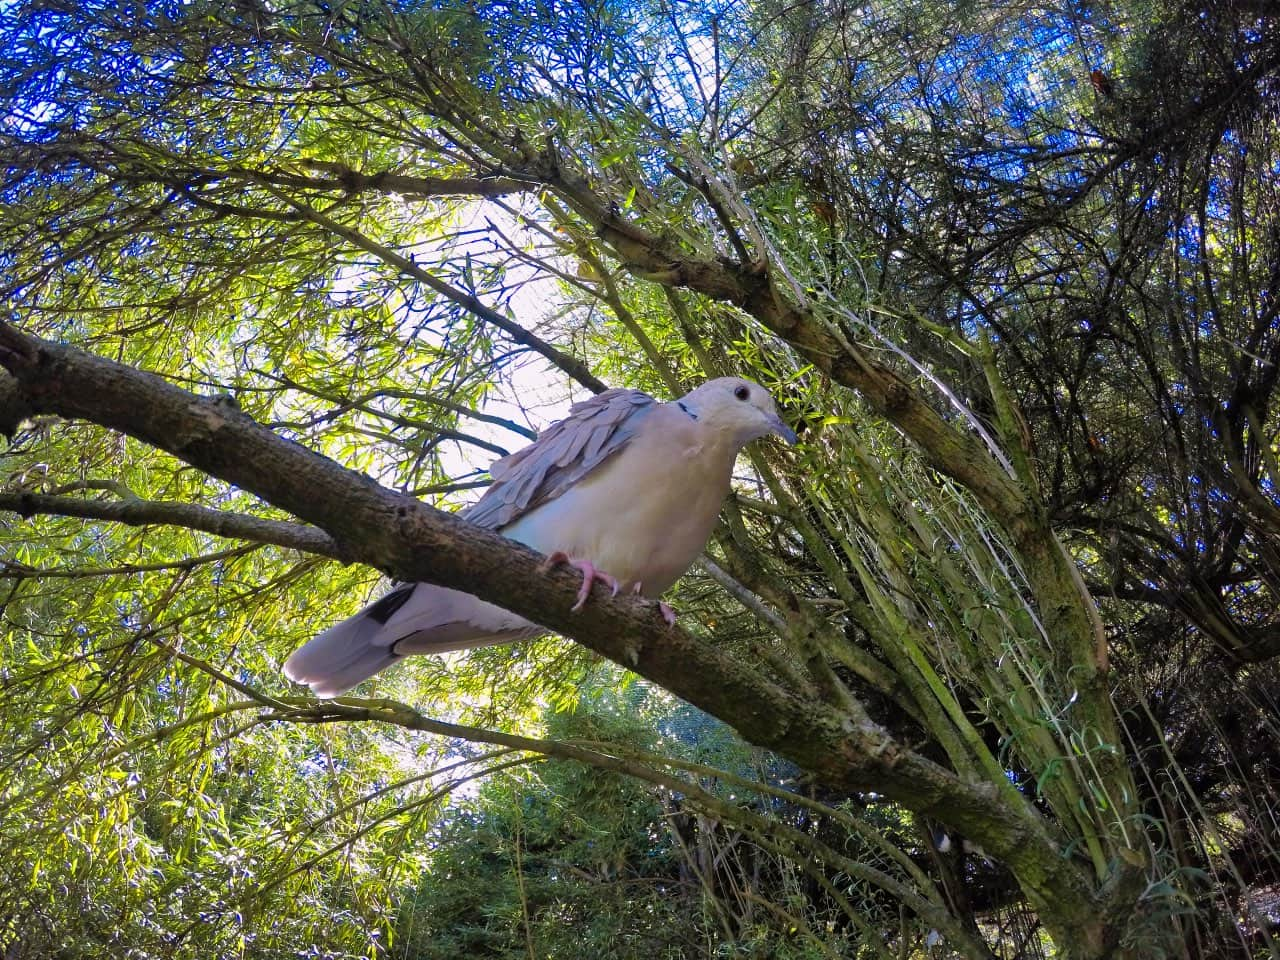 Willowbank-Wildlife-reserve-Chistchurch-Bird-in-Tree